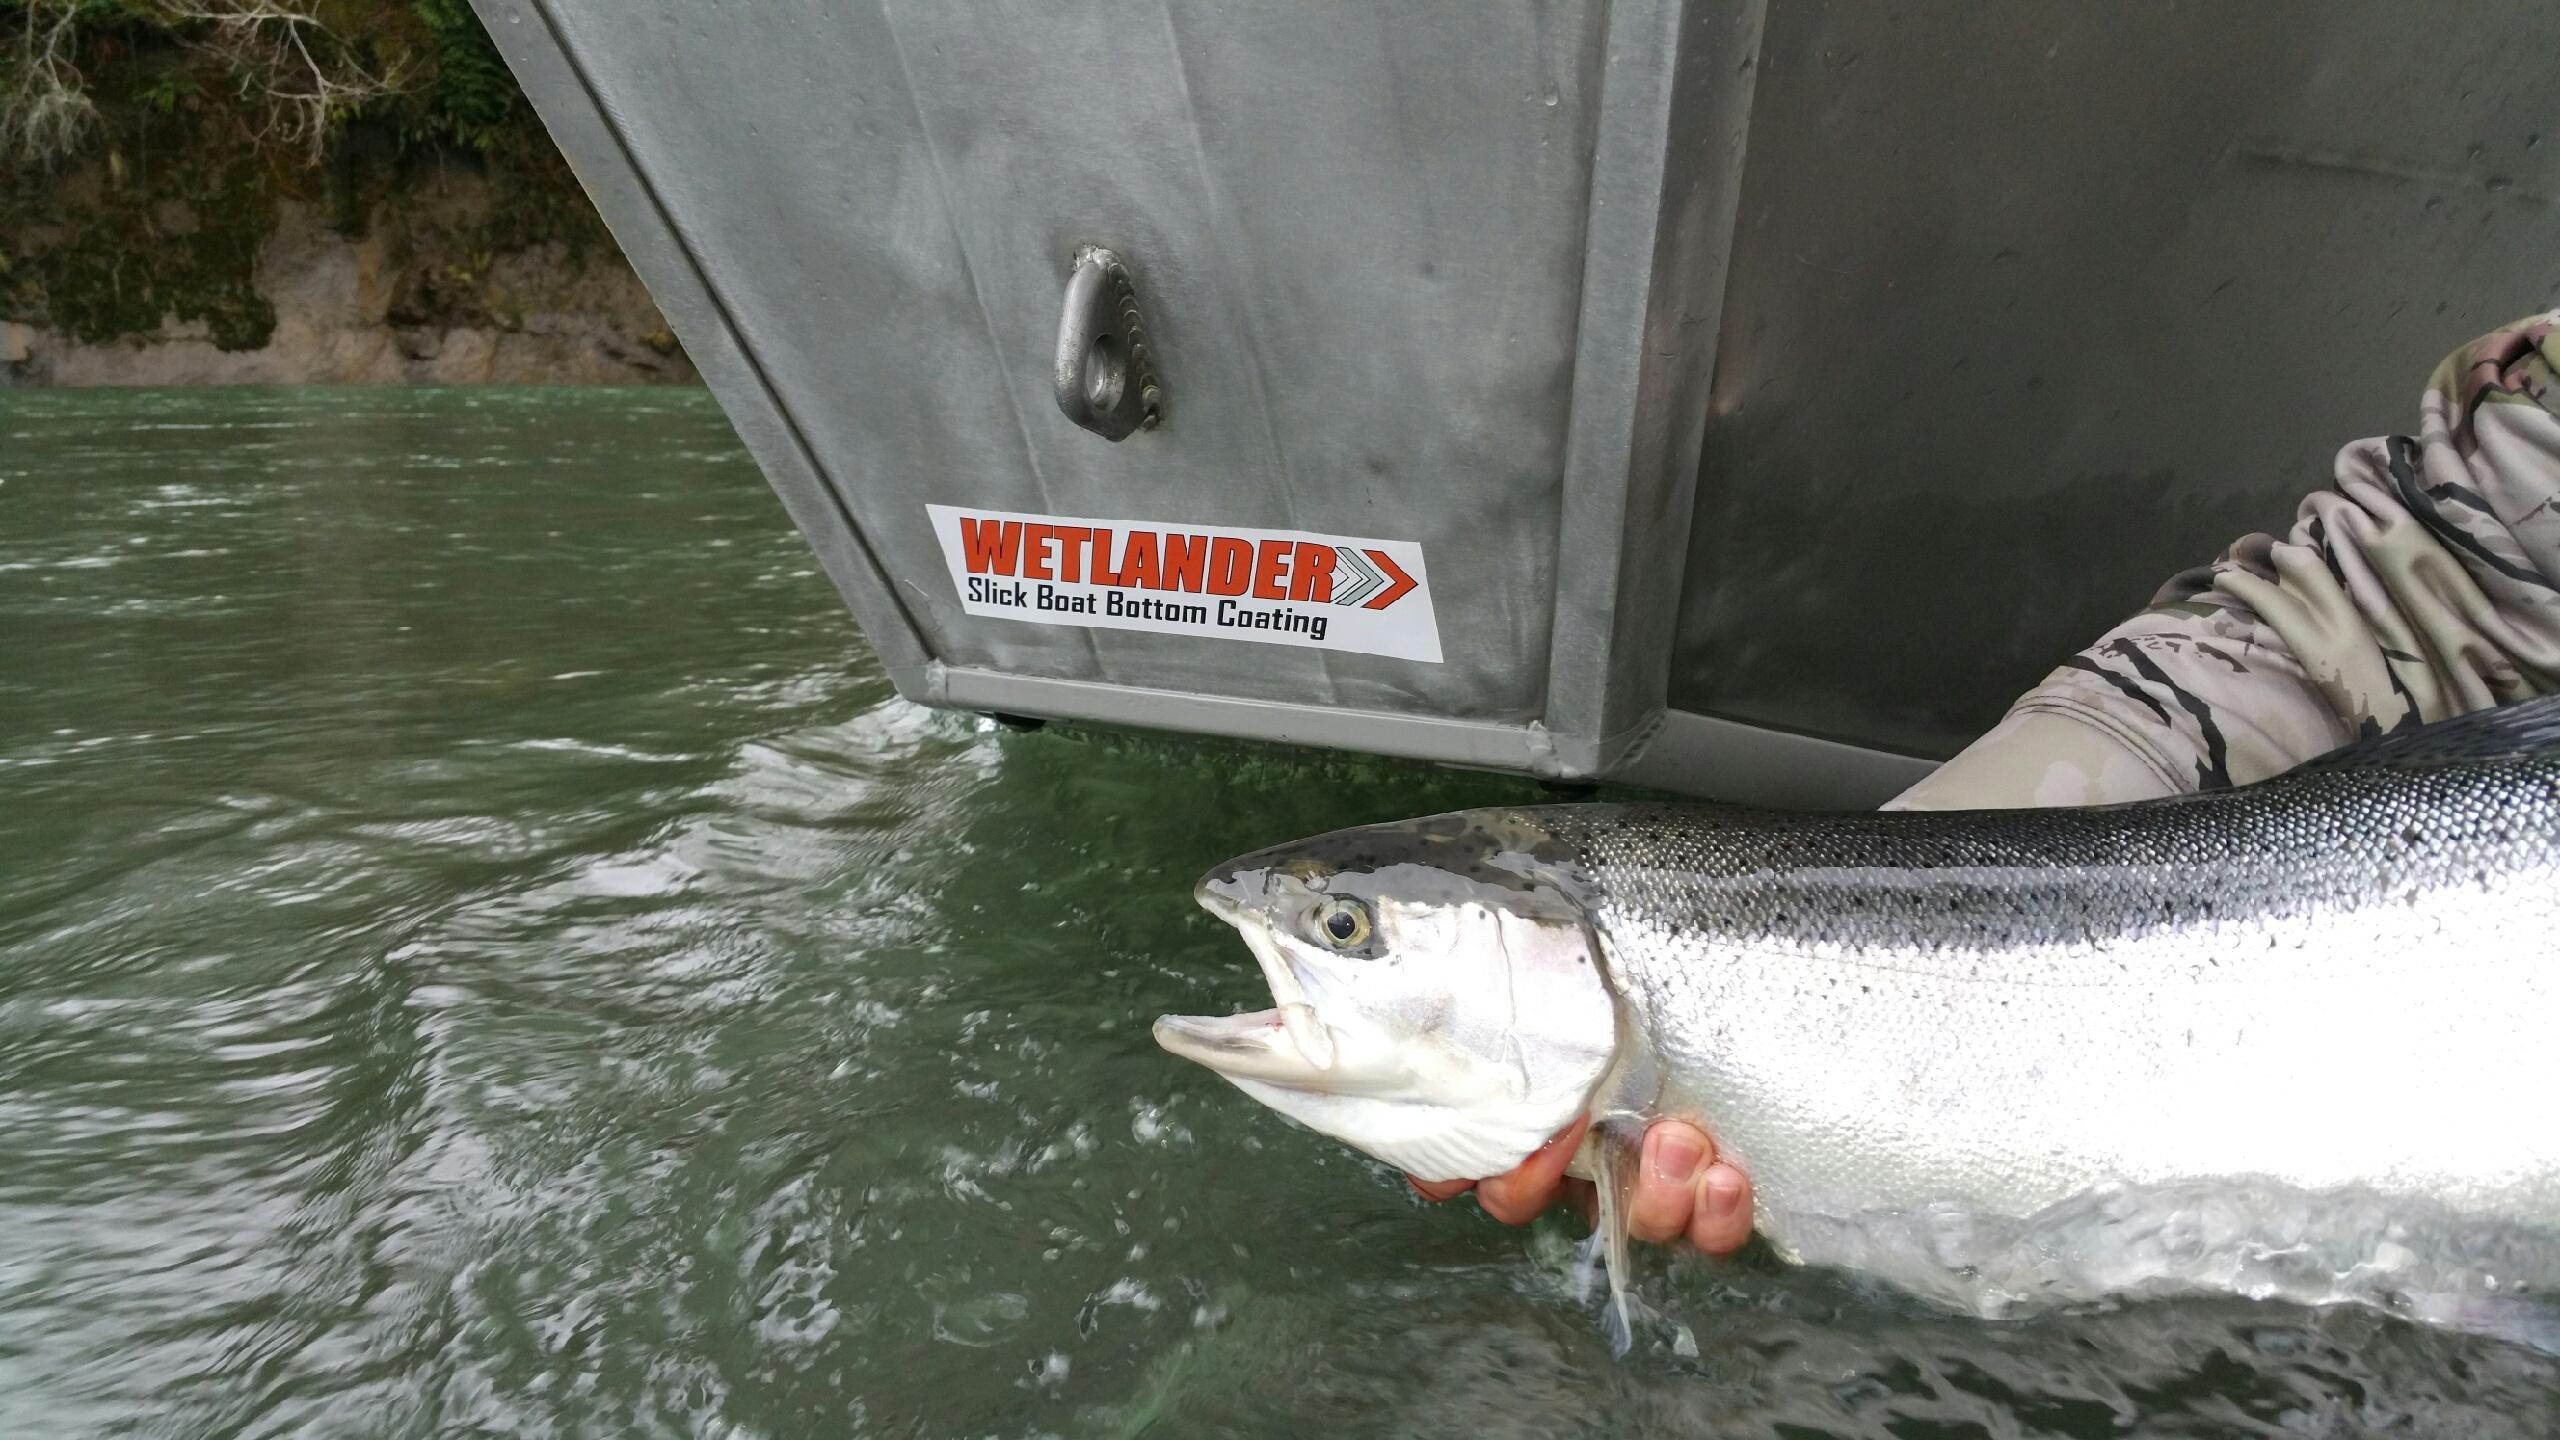 wetlander.com